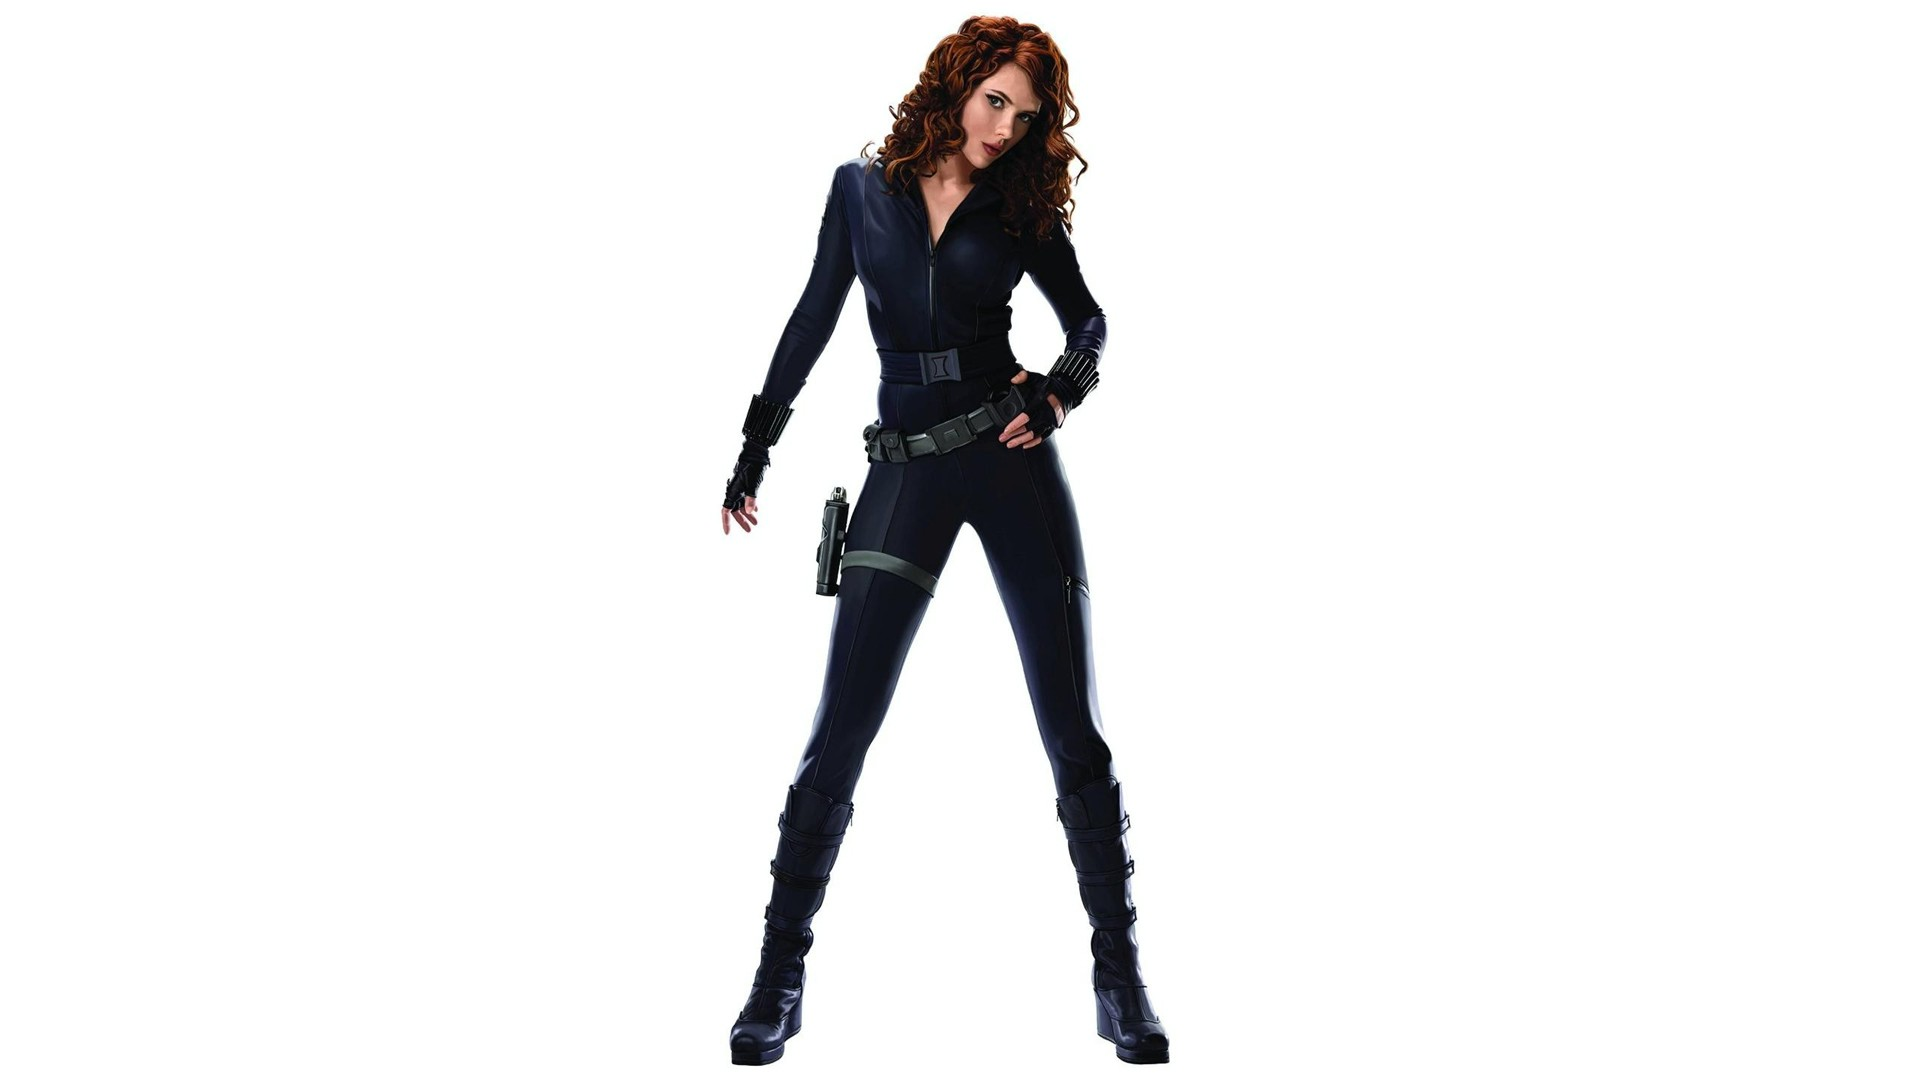 Iron Man 2 Black Background Movies Wallpaper: Black Widow HD Wallpaper